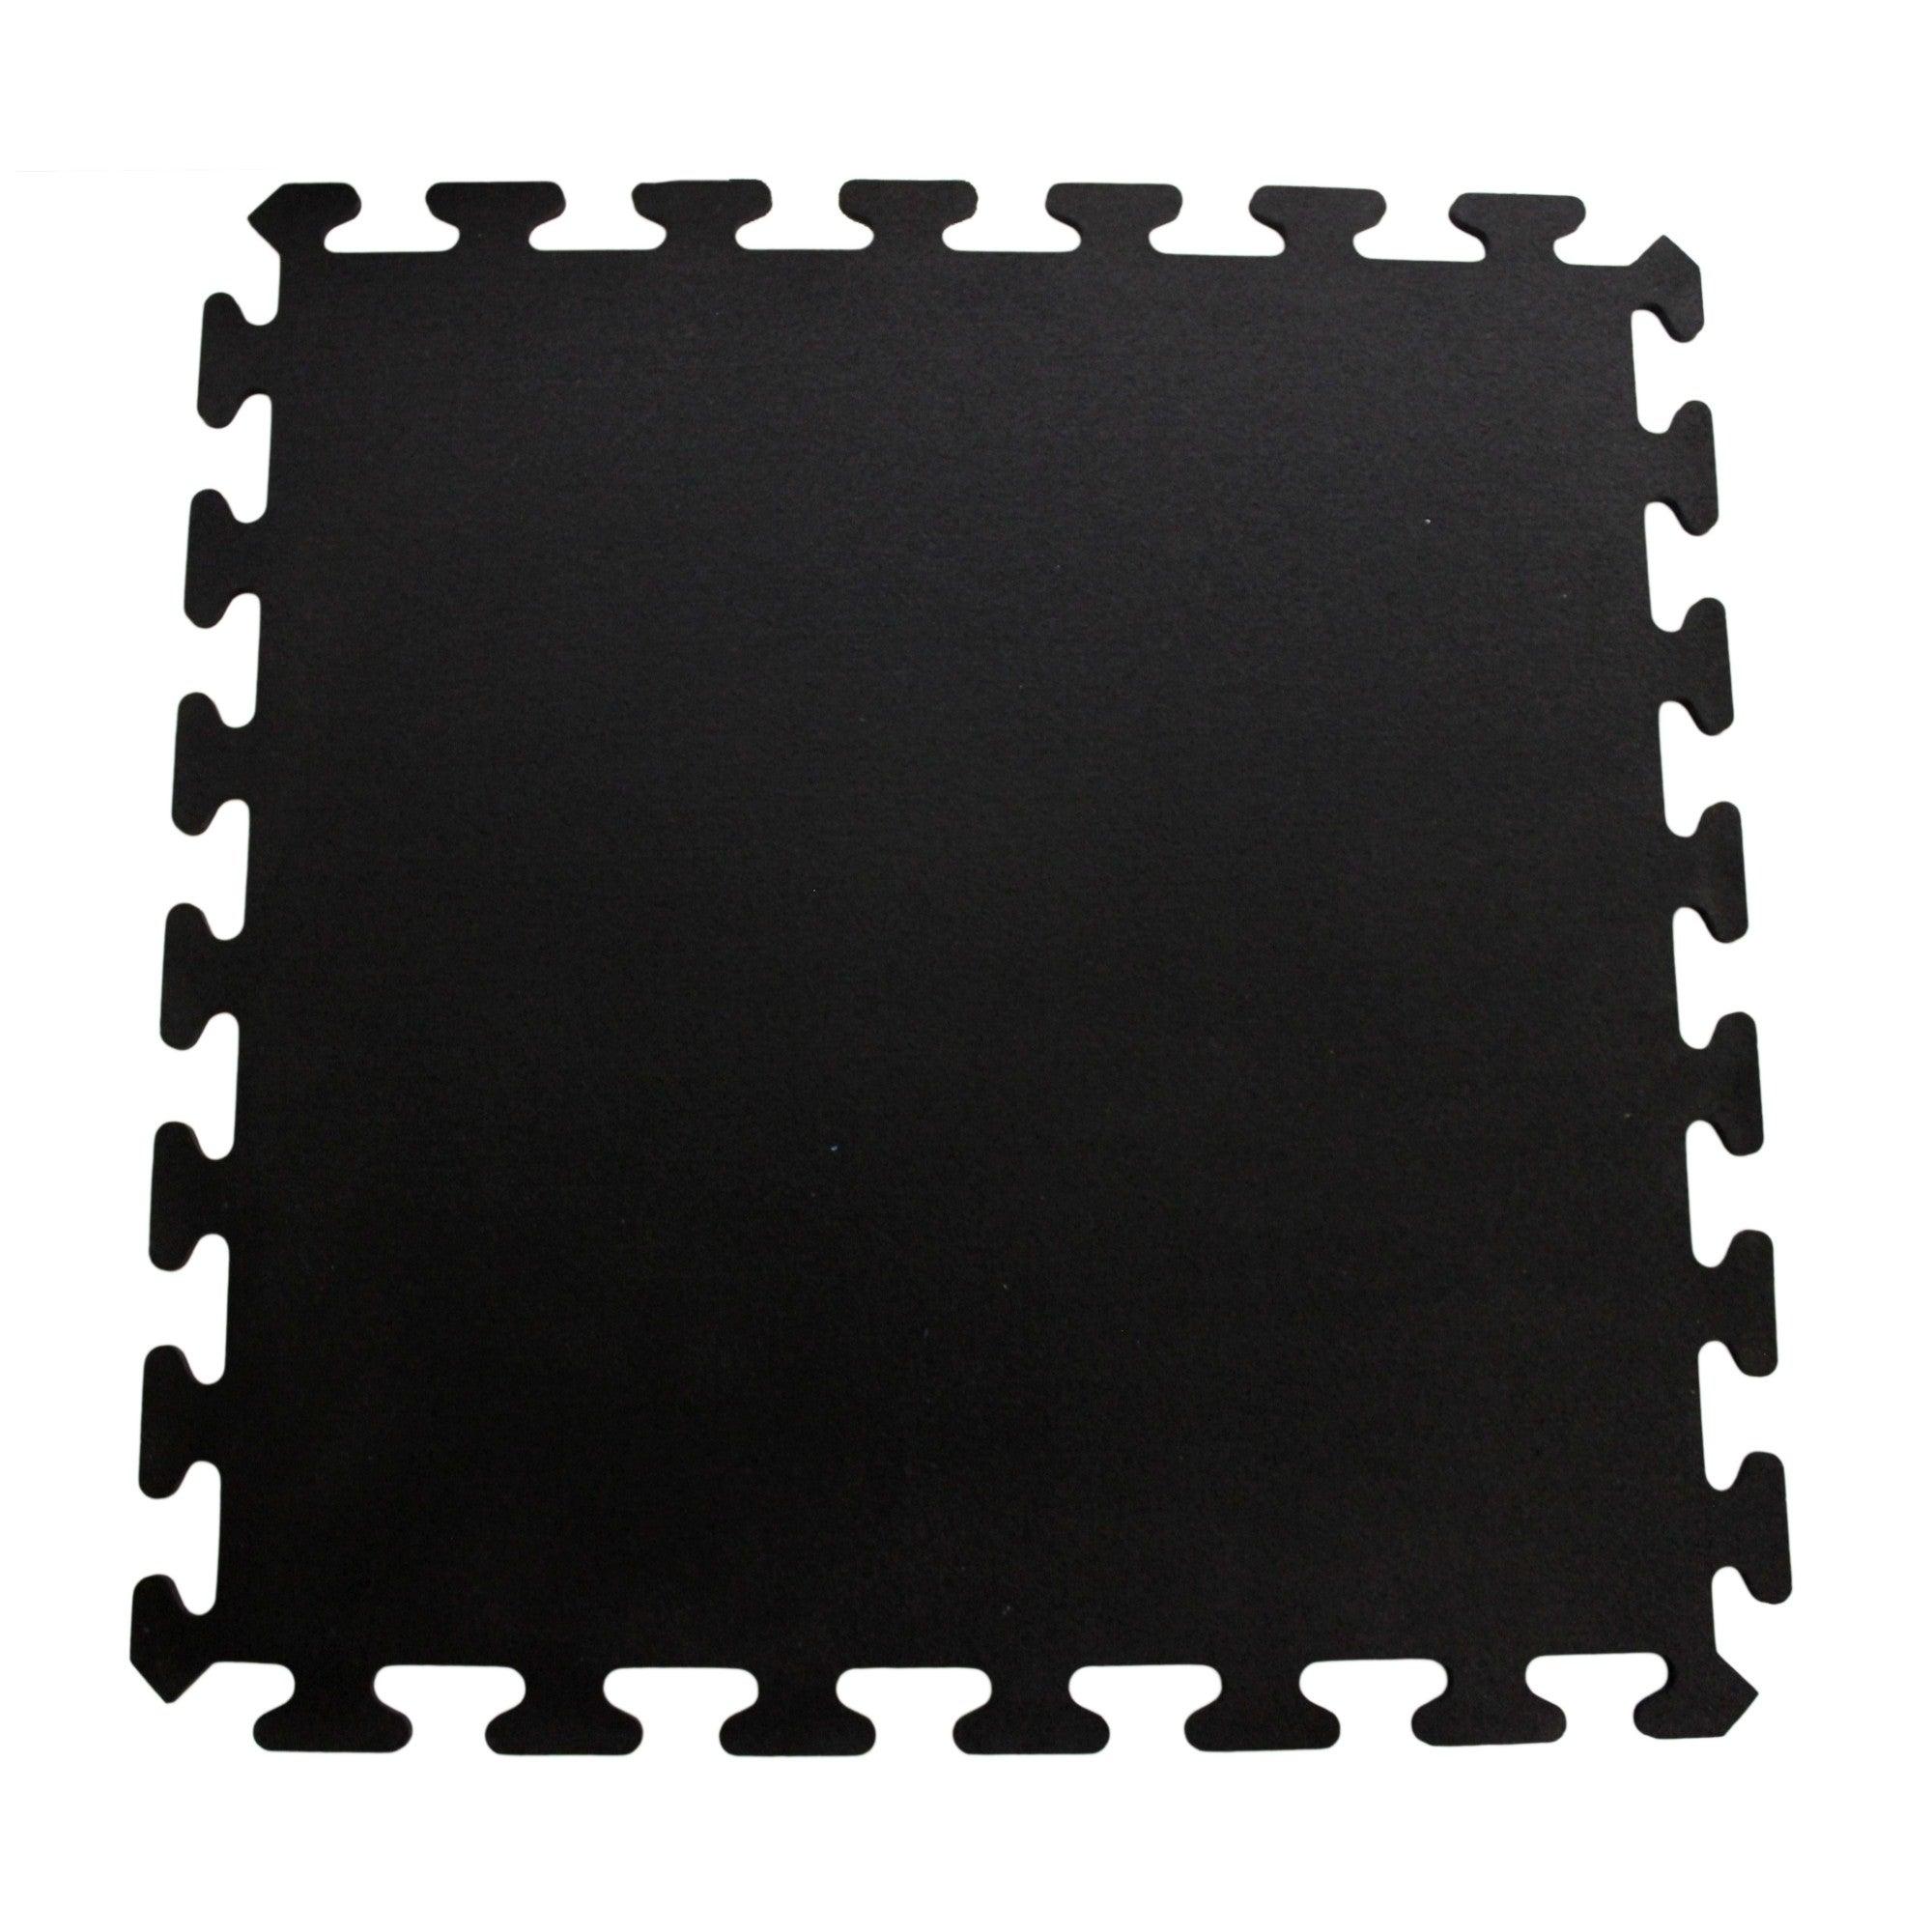 Mats Inc Iflex Recycled Rubber Interlocking Floor Tiles In Black Ebay